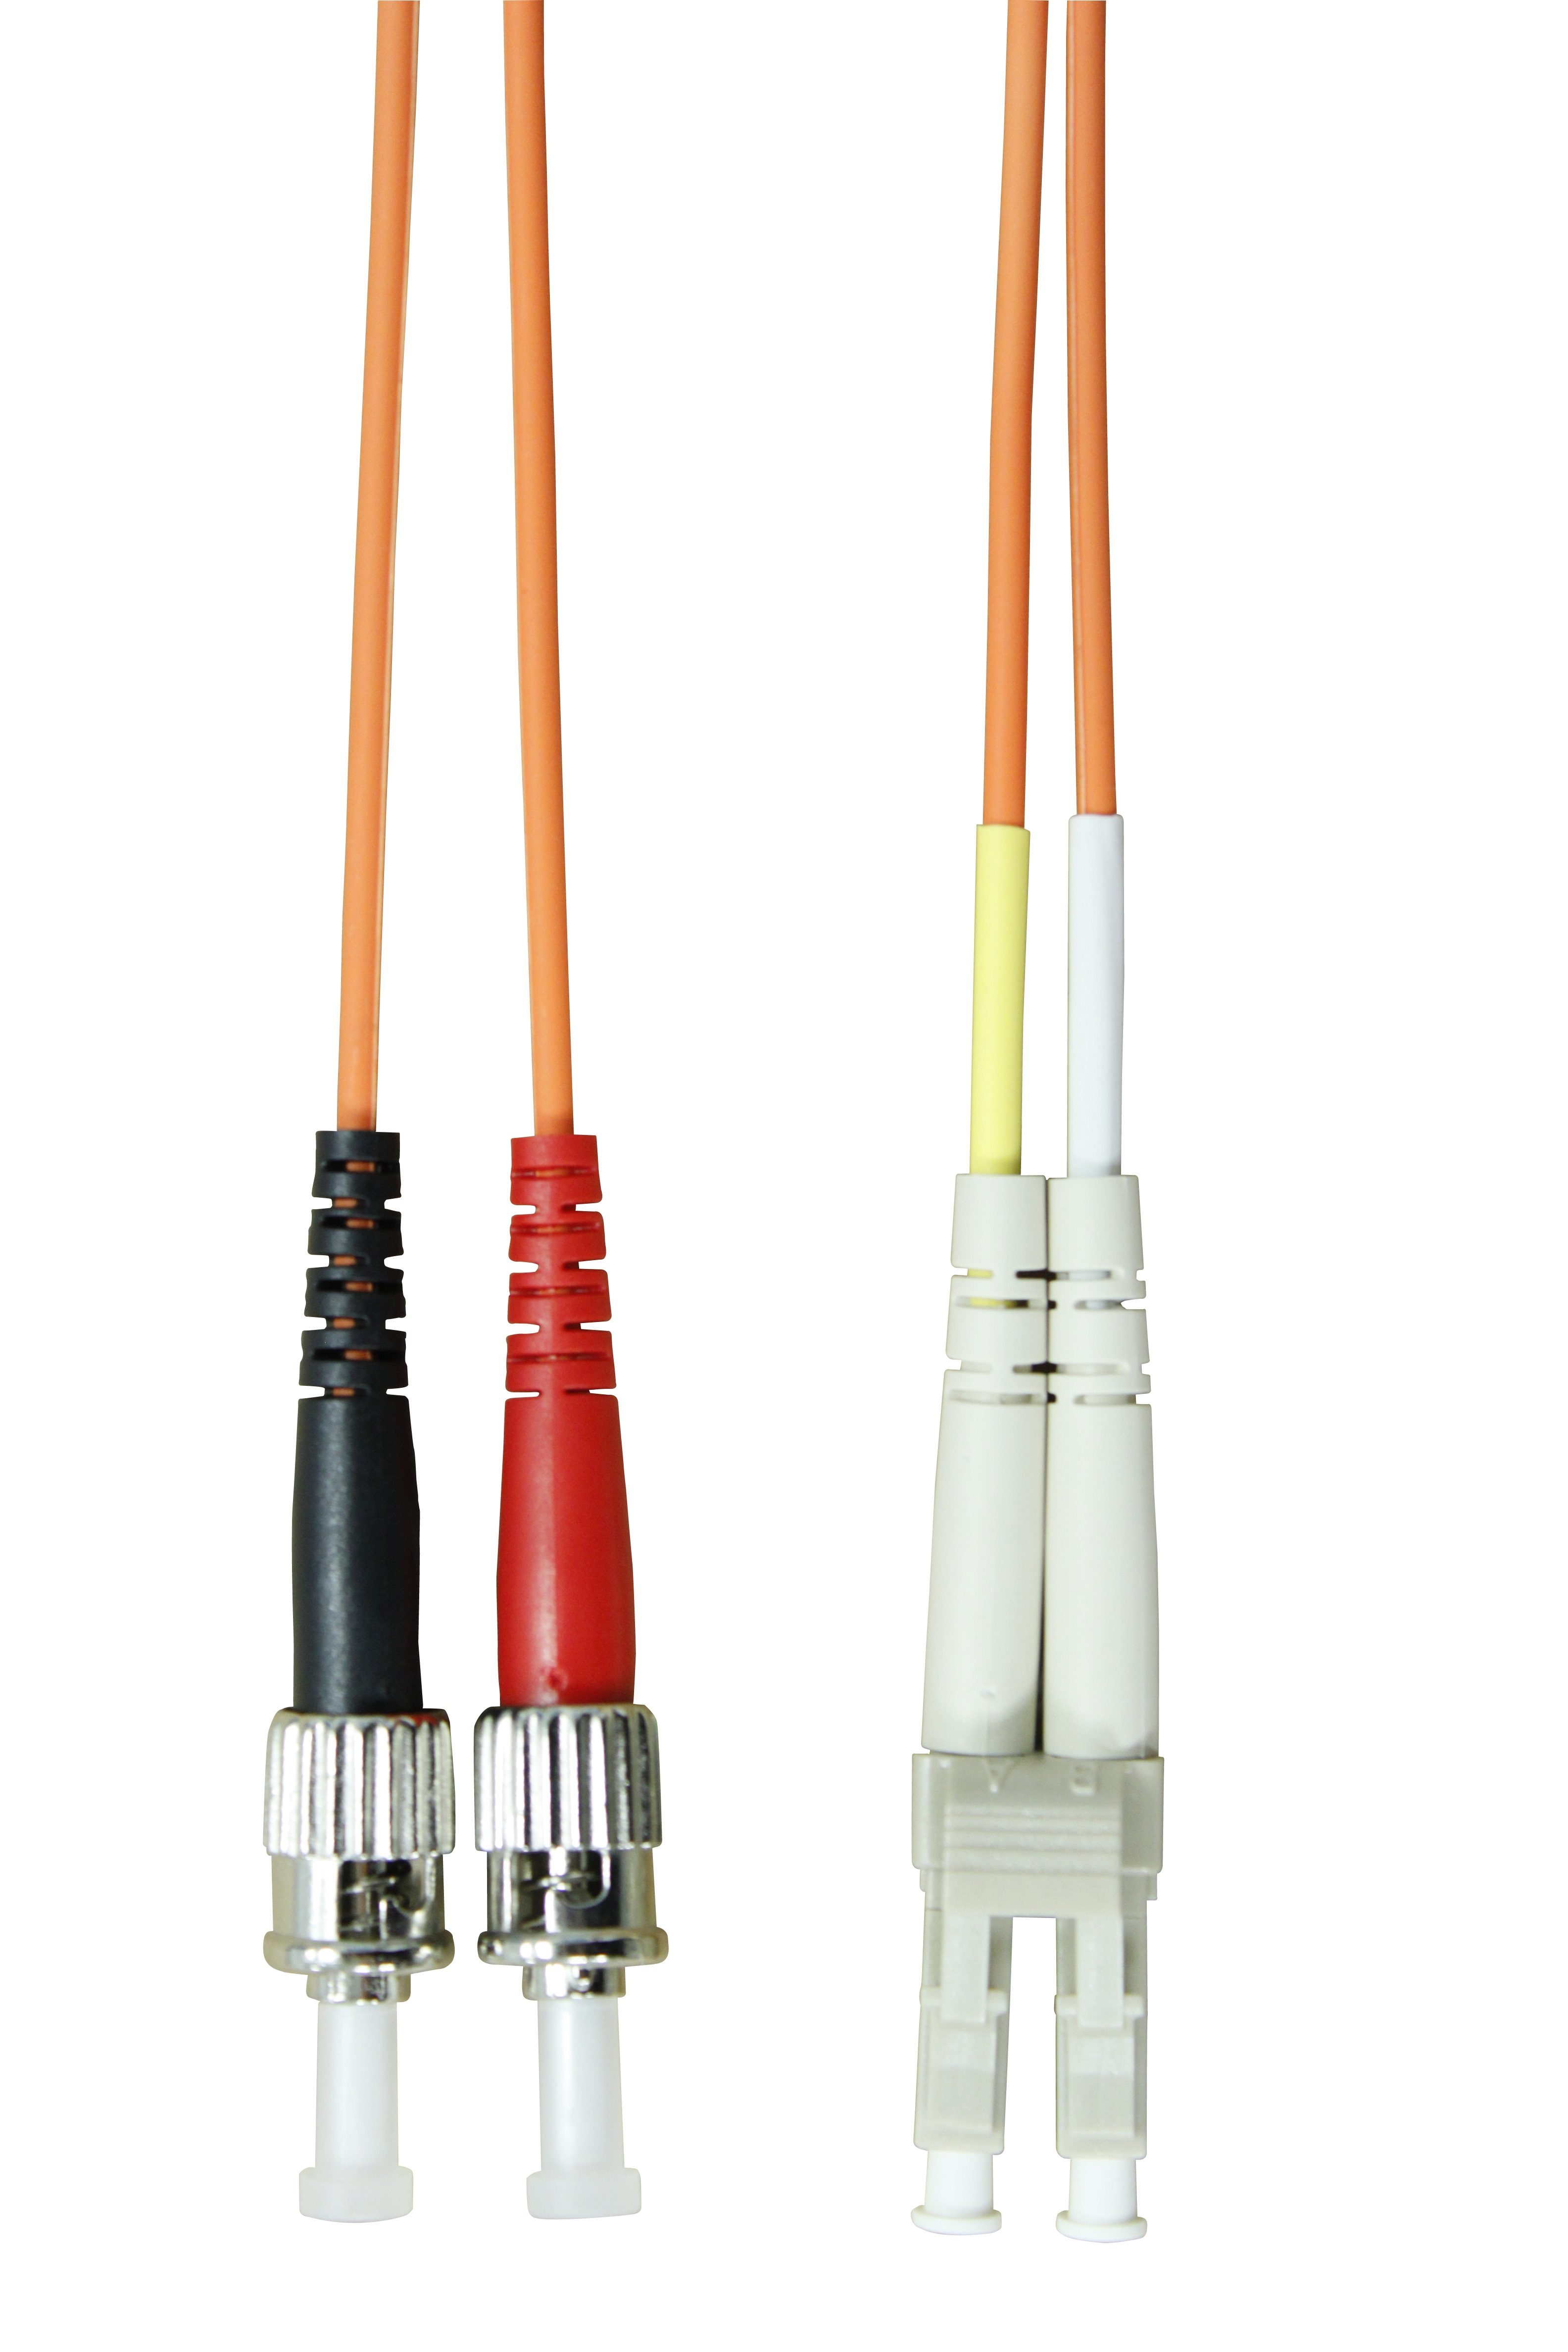 1 Stk LWL Patchkabel Duplex LC/ST,62,5/125µm OM1, LS0H, orange, 1m HLP26LT01F